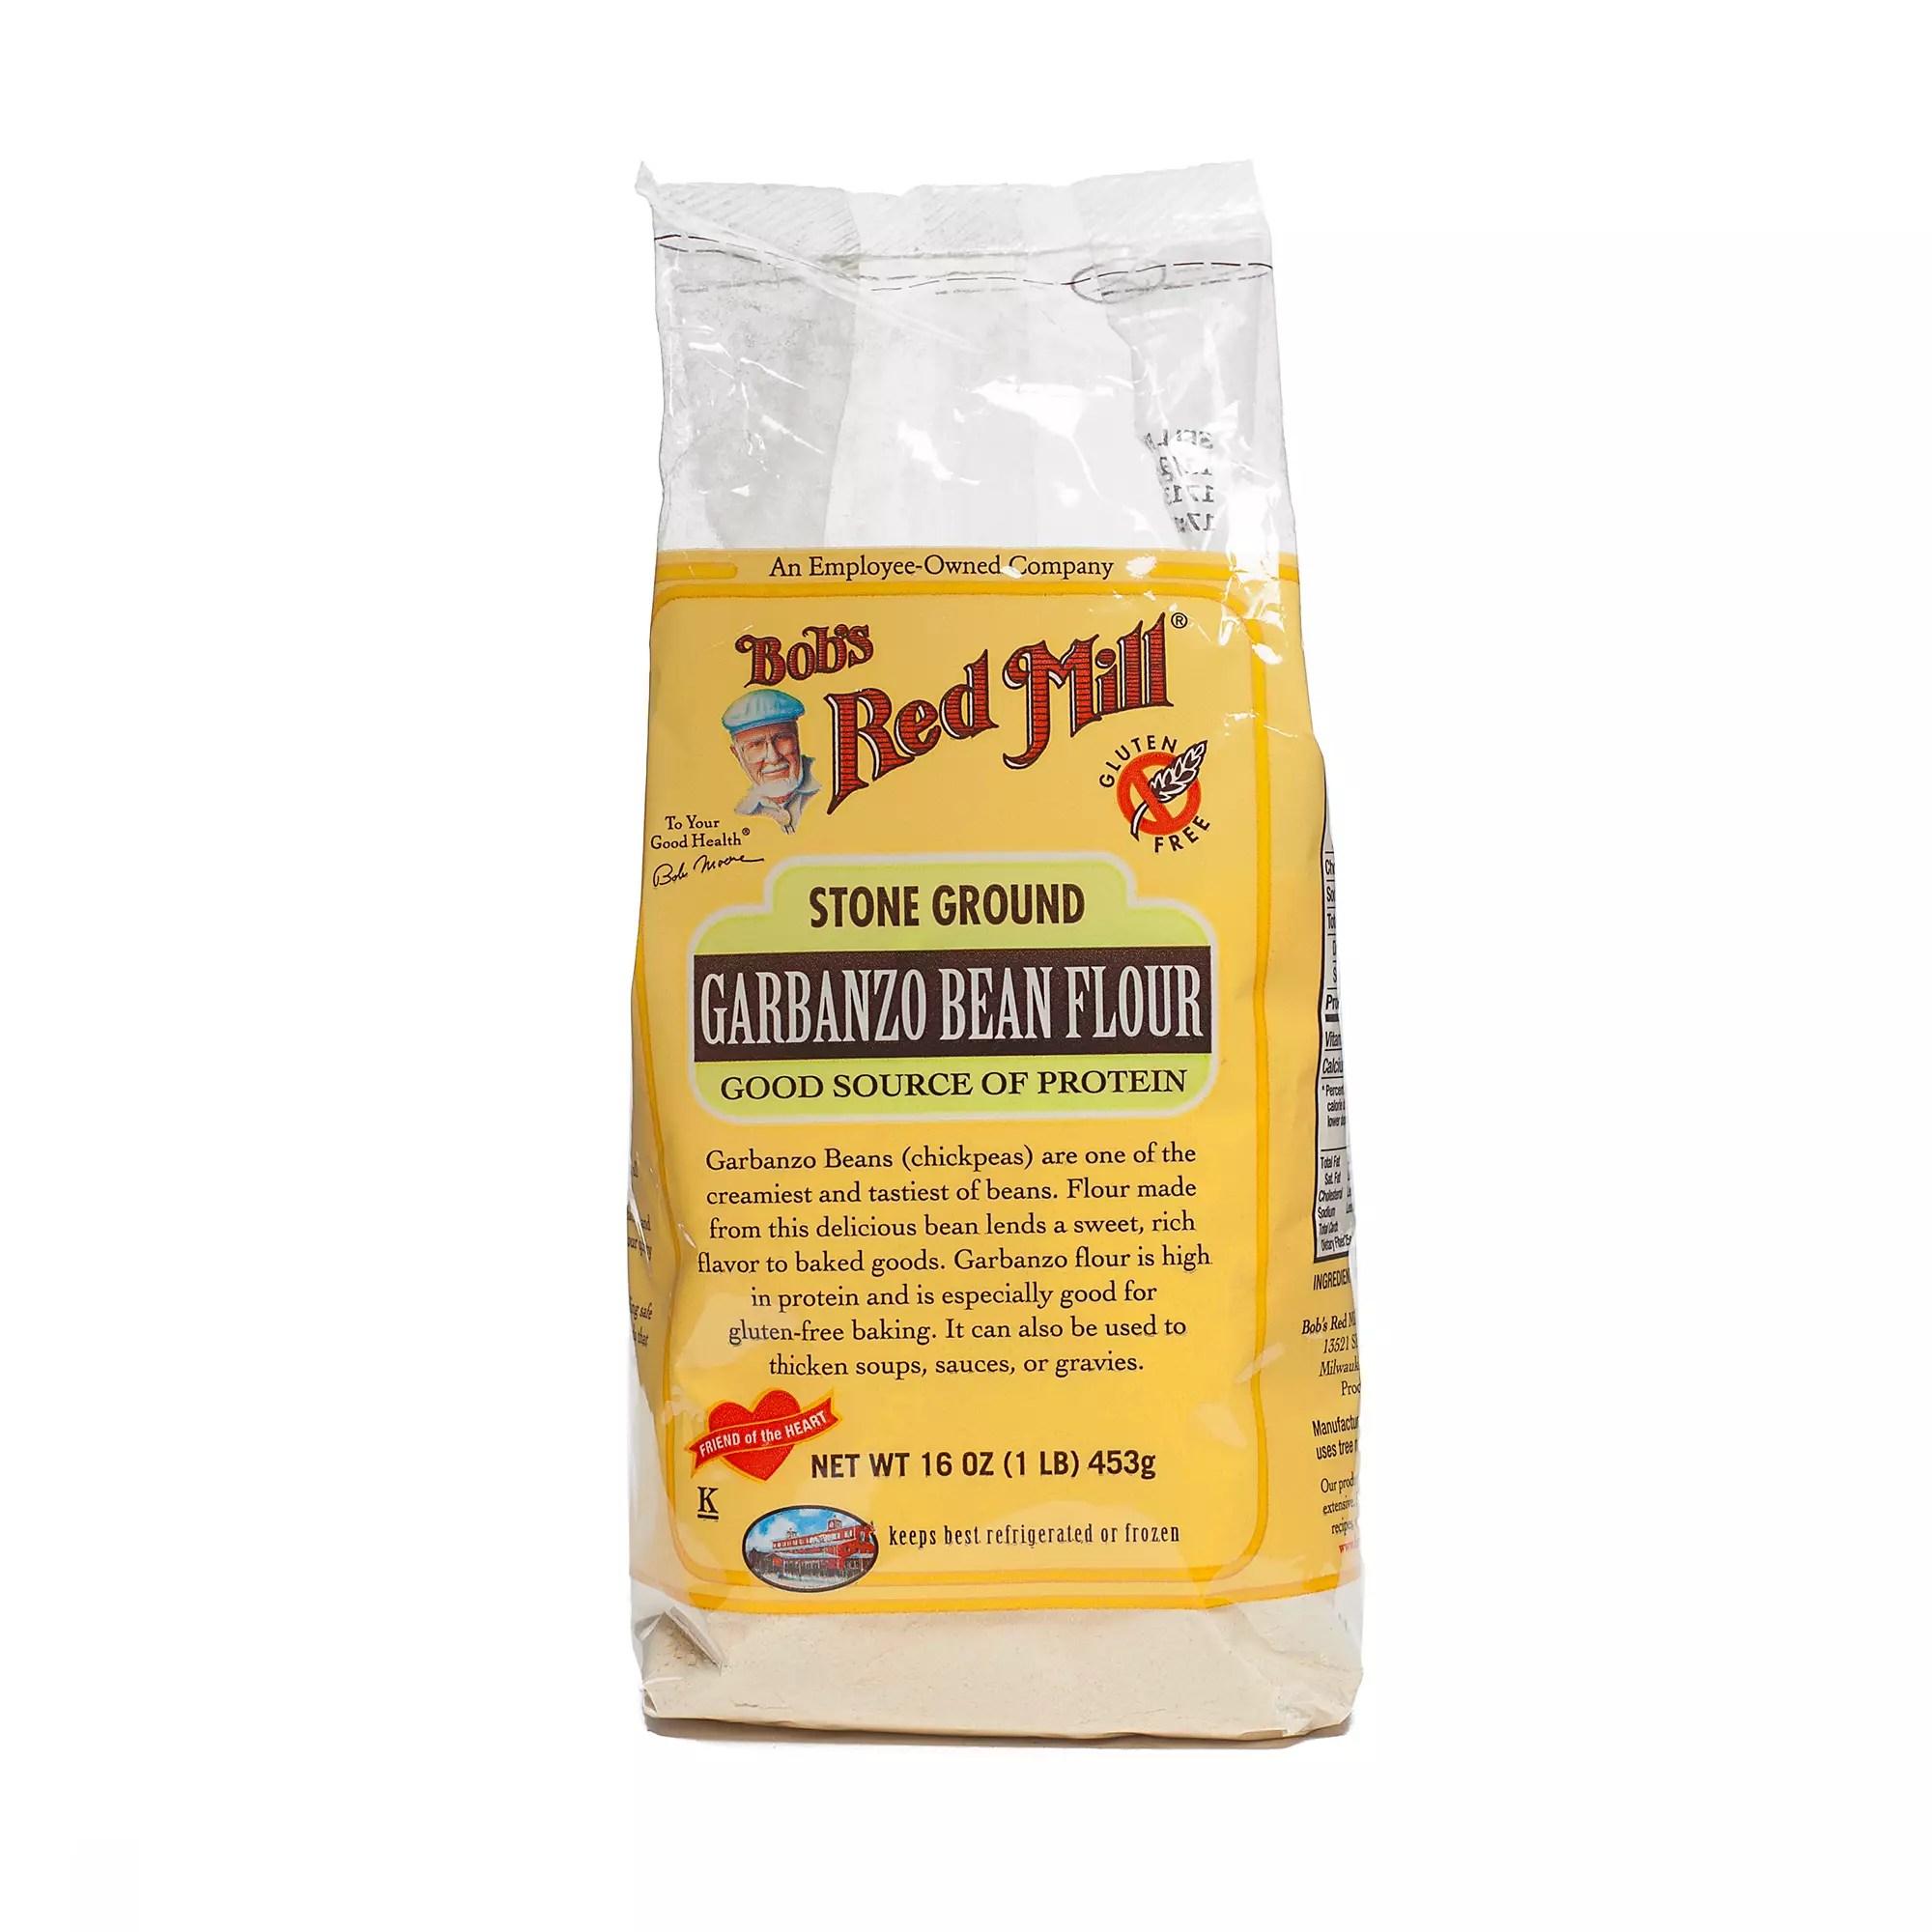 16 oz Garbanzo Bean Flour by Bob's Red Mill - Thrive Market